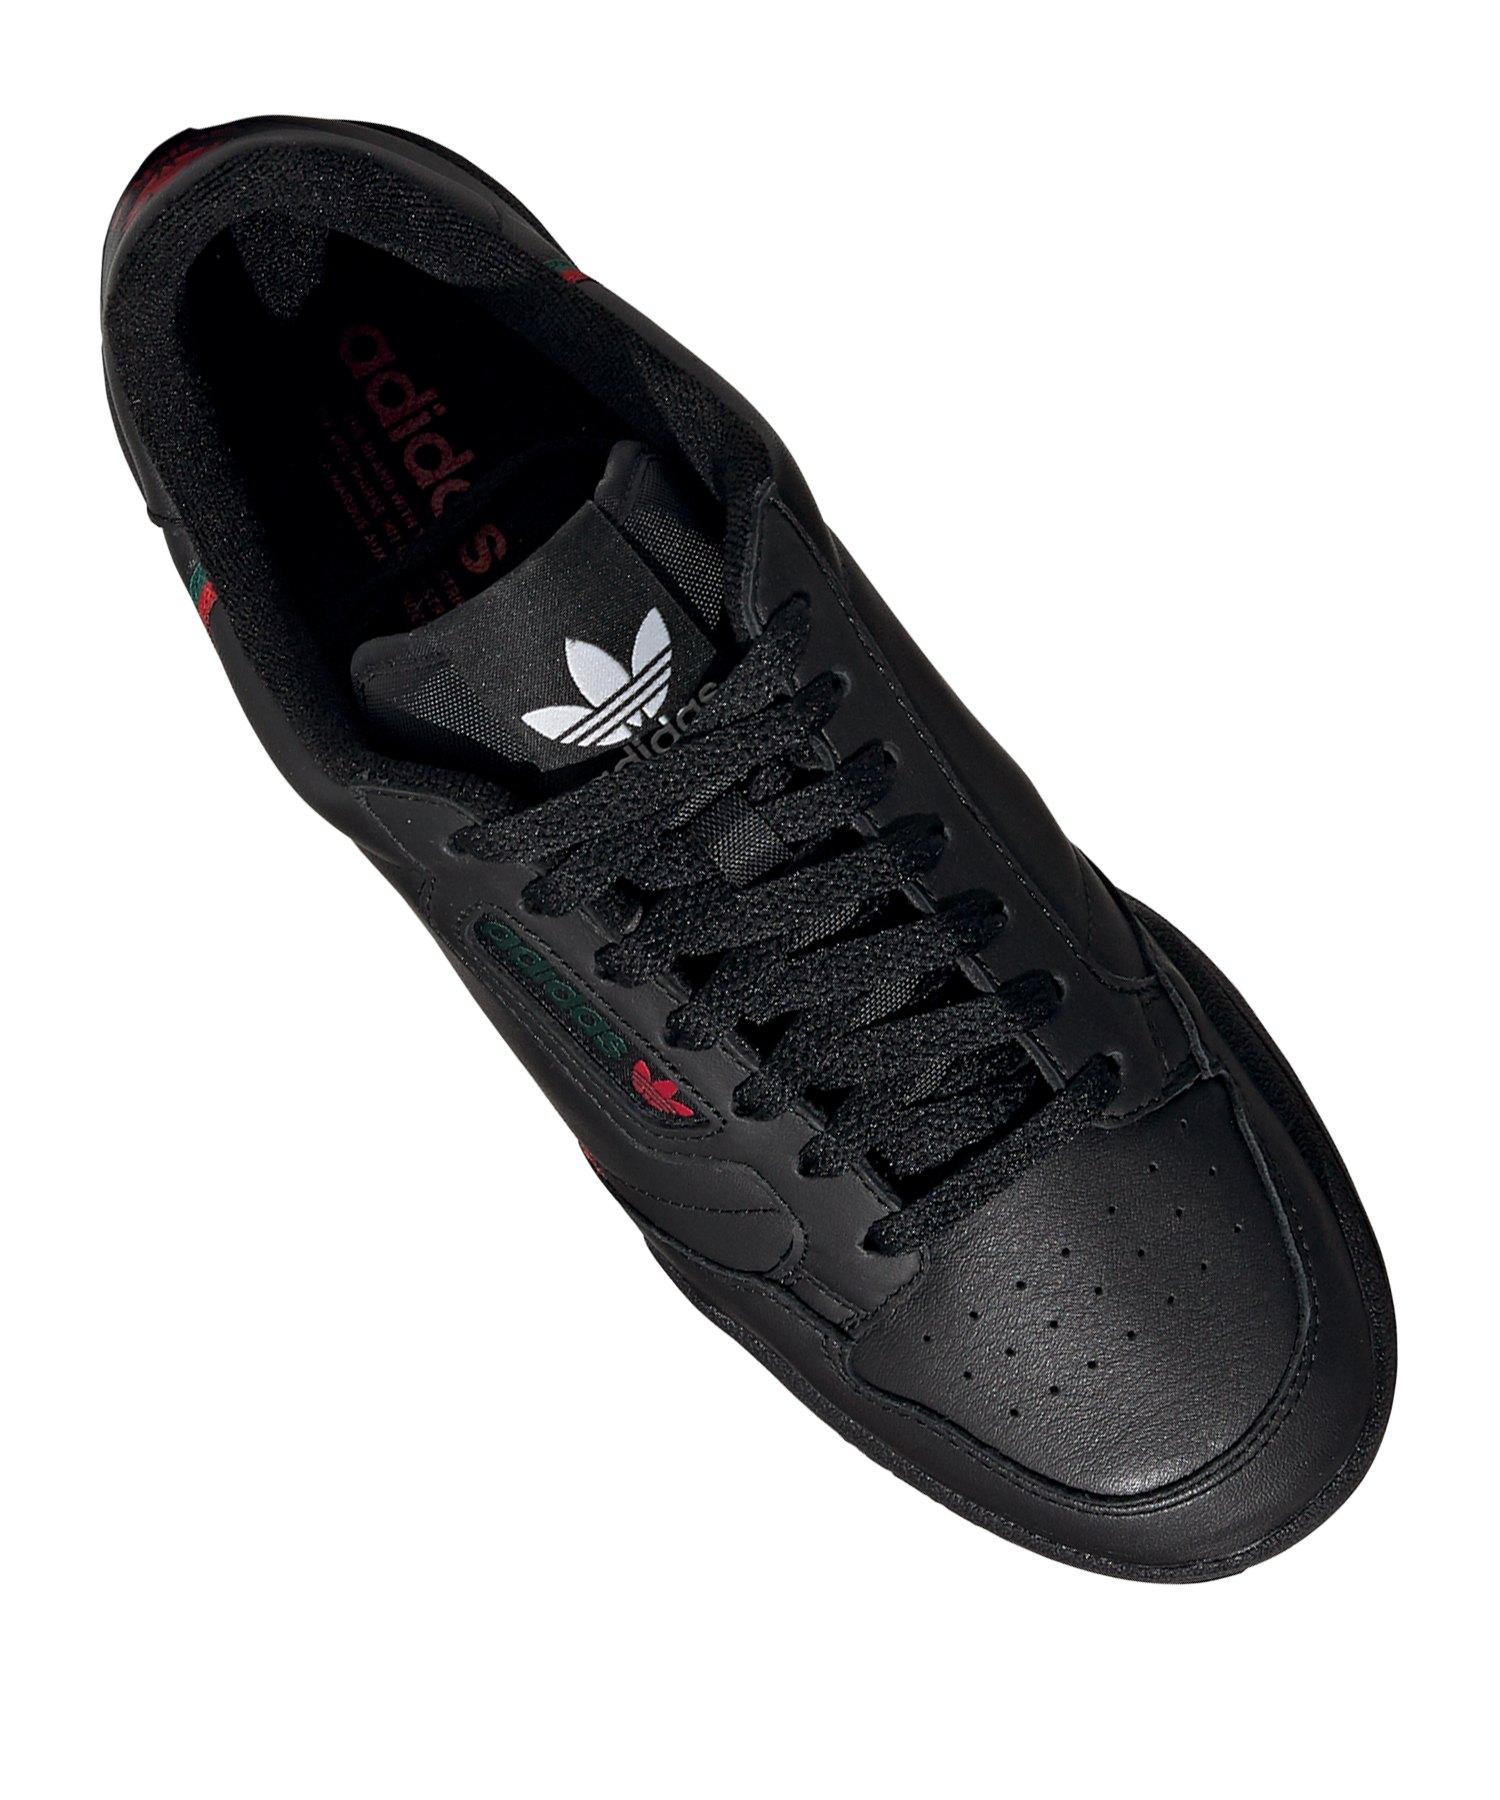 Sneaker Schwarz 80 Continental Adidas Originals uc1lFTK3J